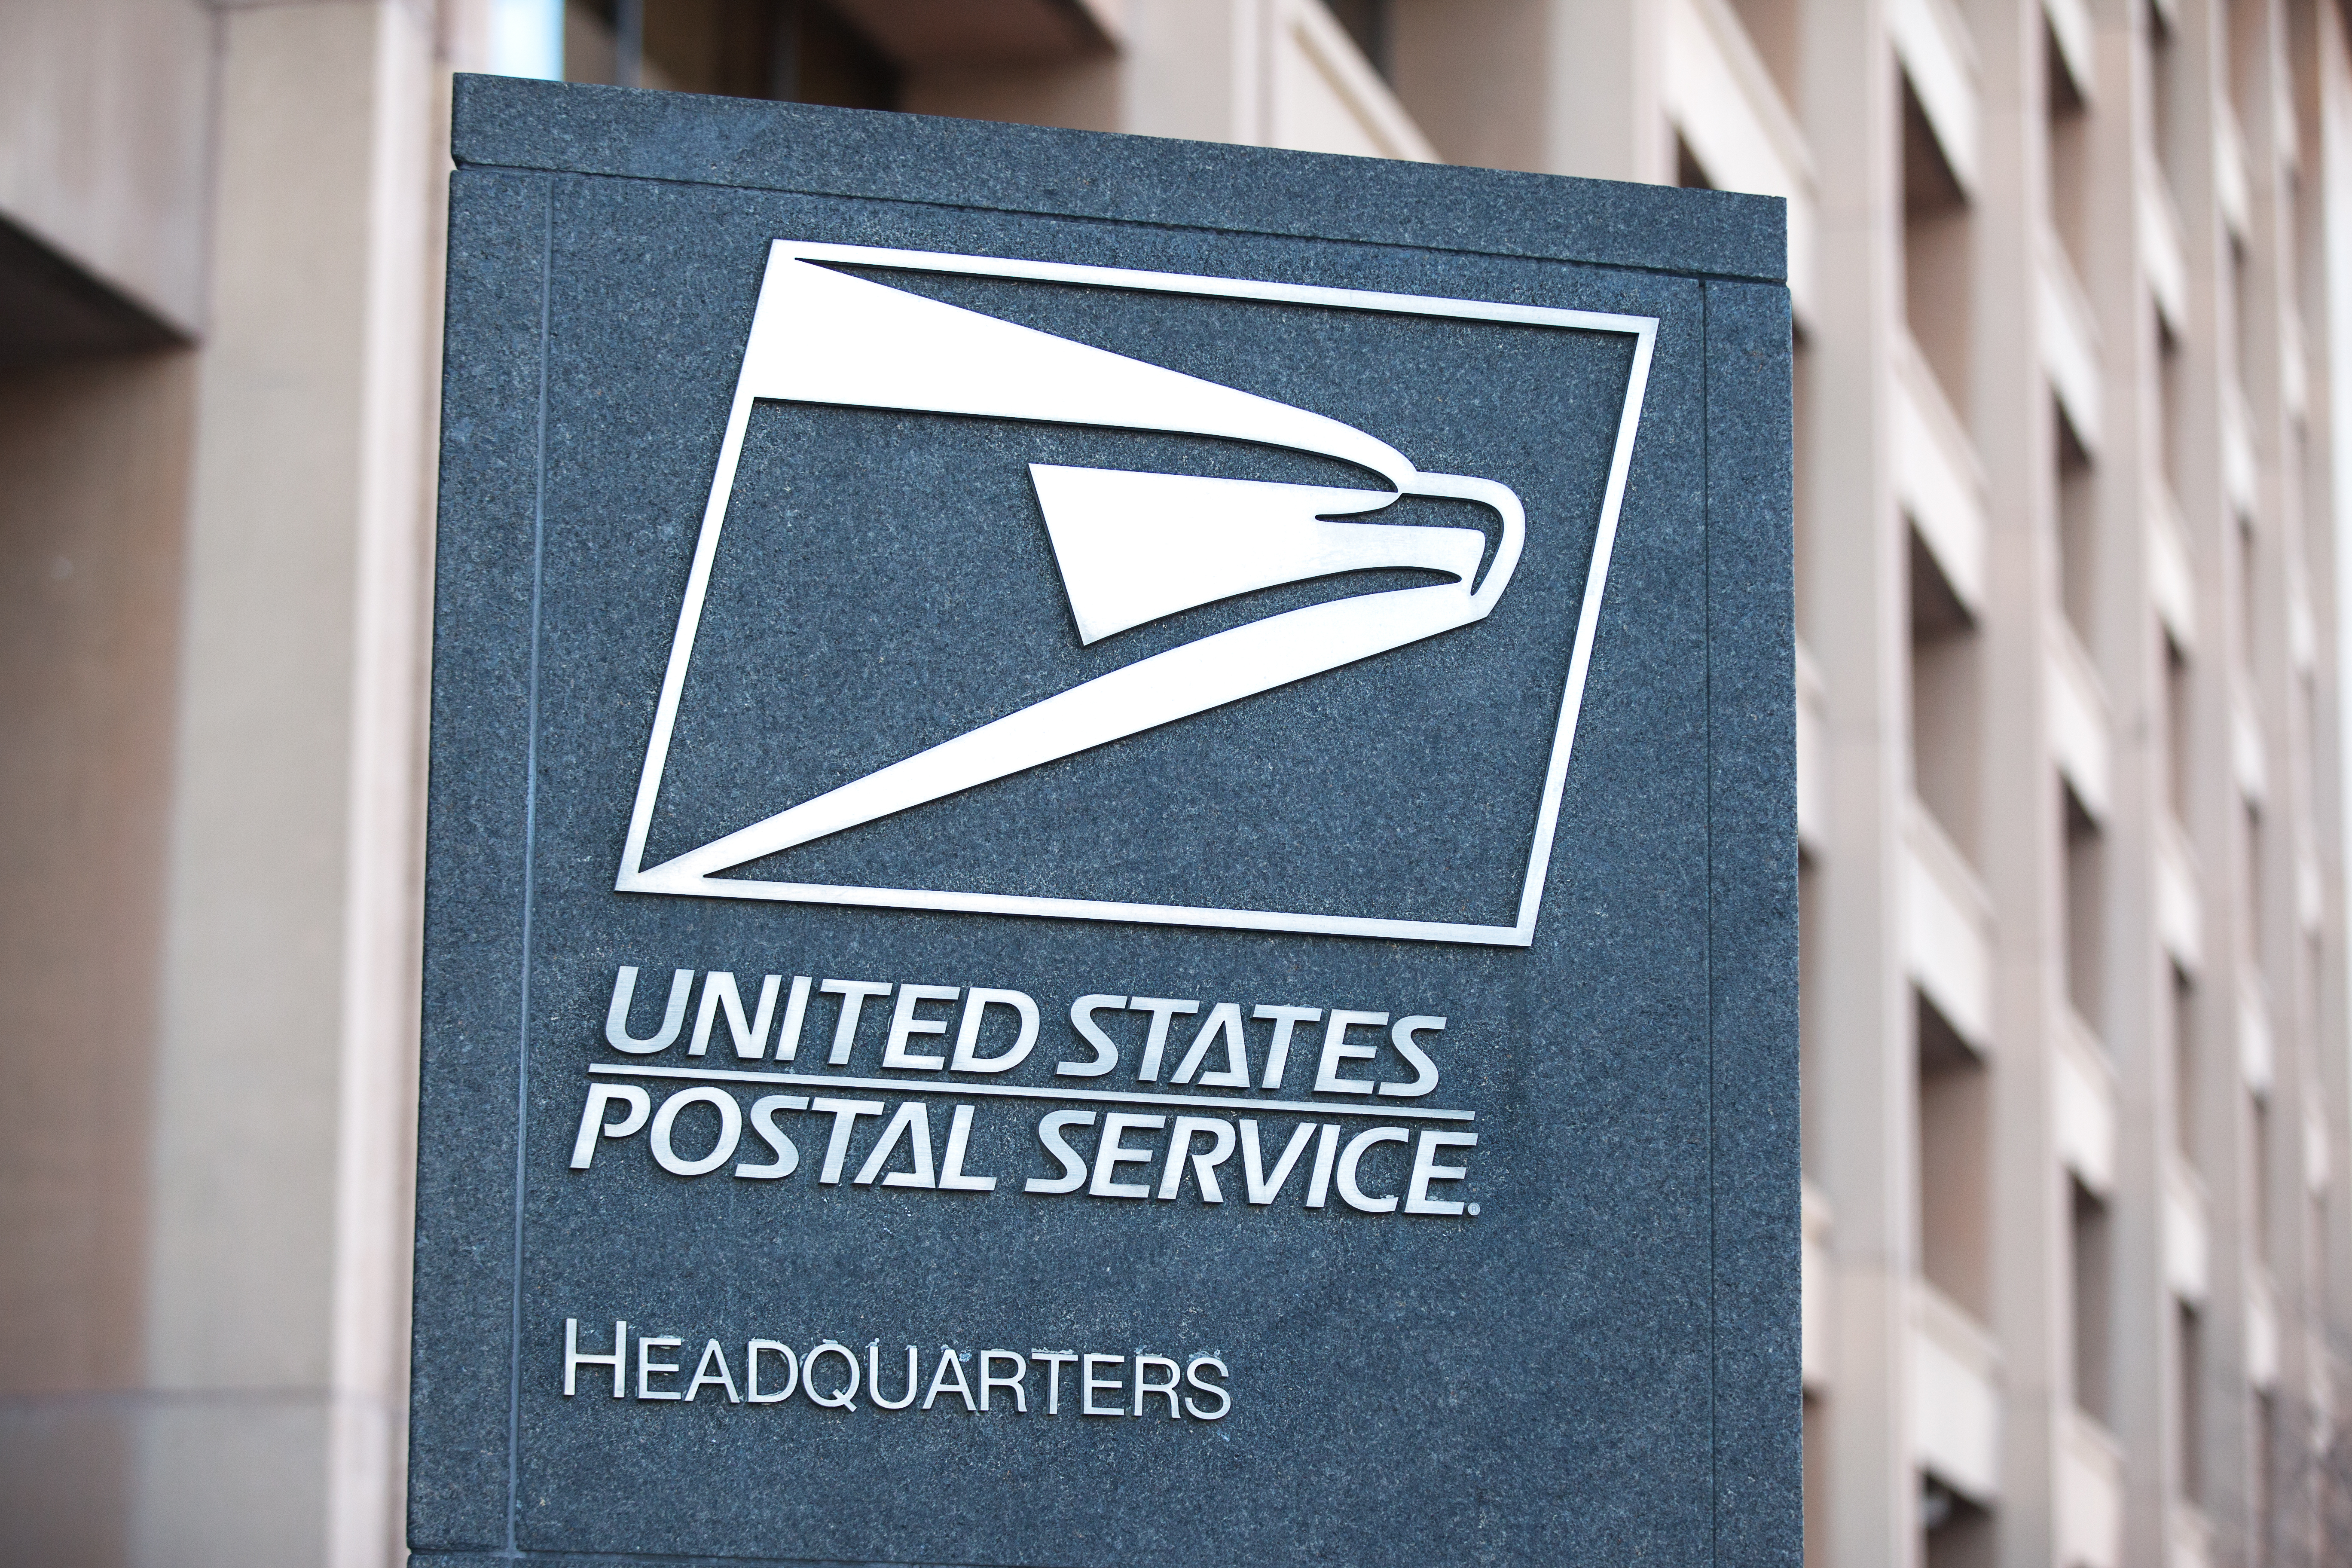 Rrd blog postal action alert united states postal service postal service sign buycottarizona